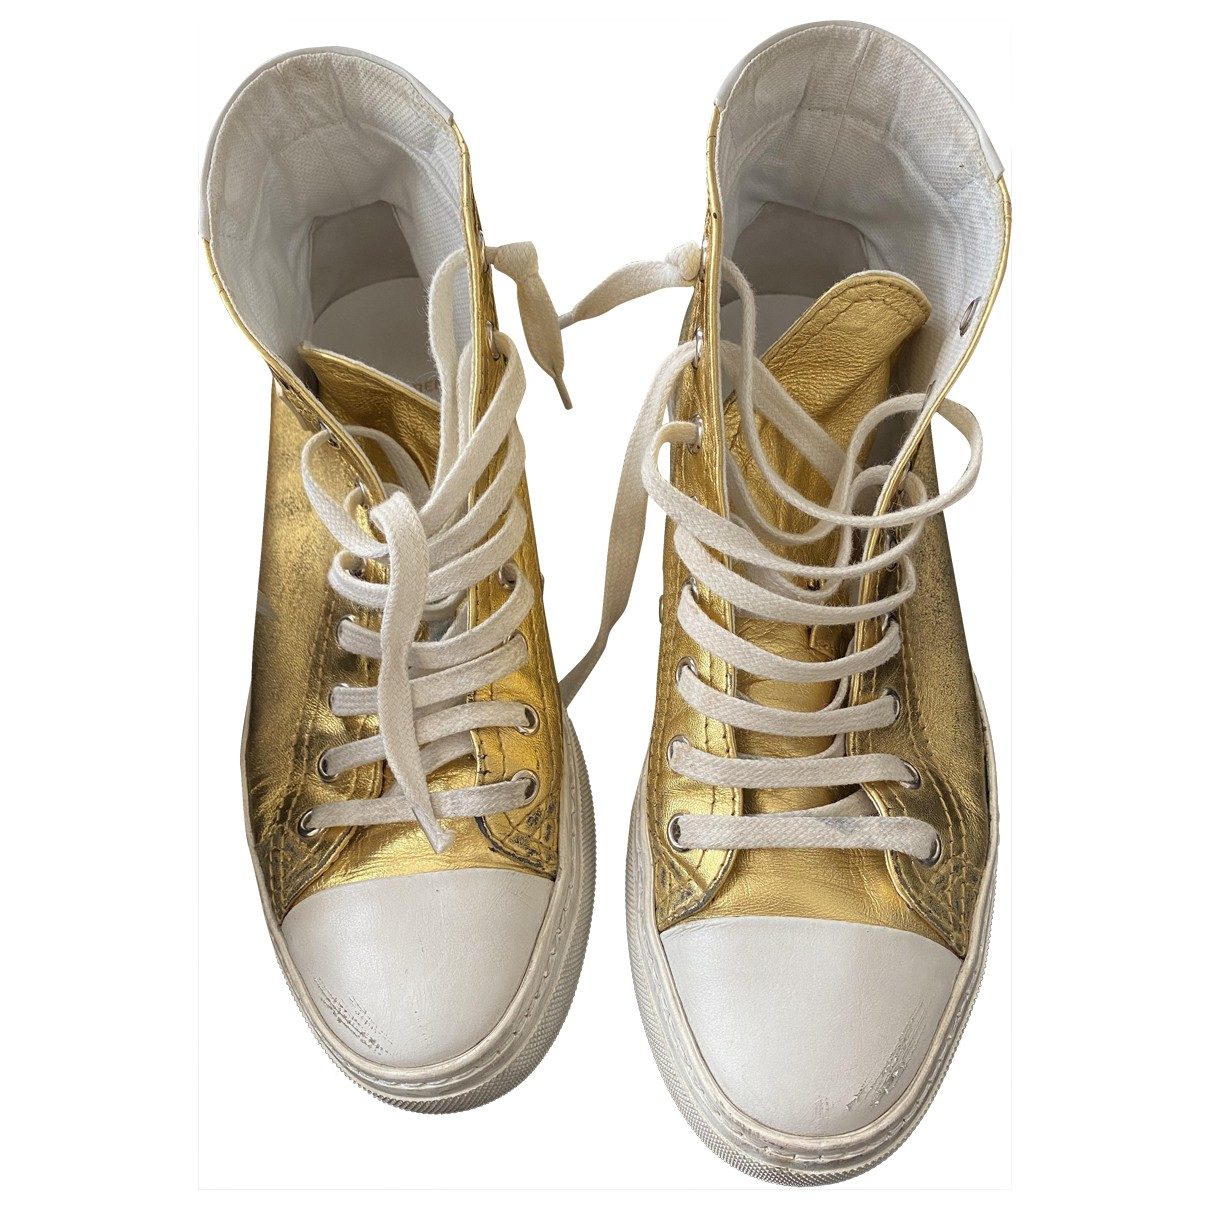 Saint Laurent Bedford Gold Leather Trainers for Women 37 EU